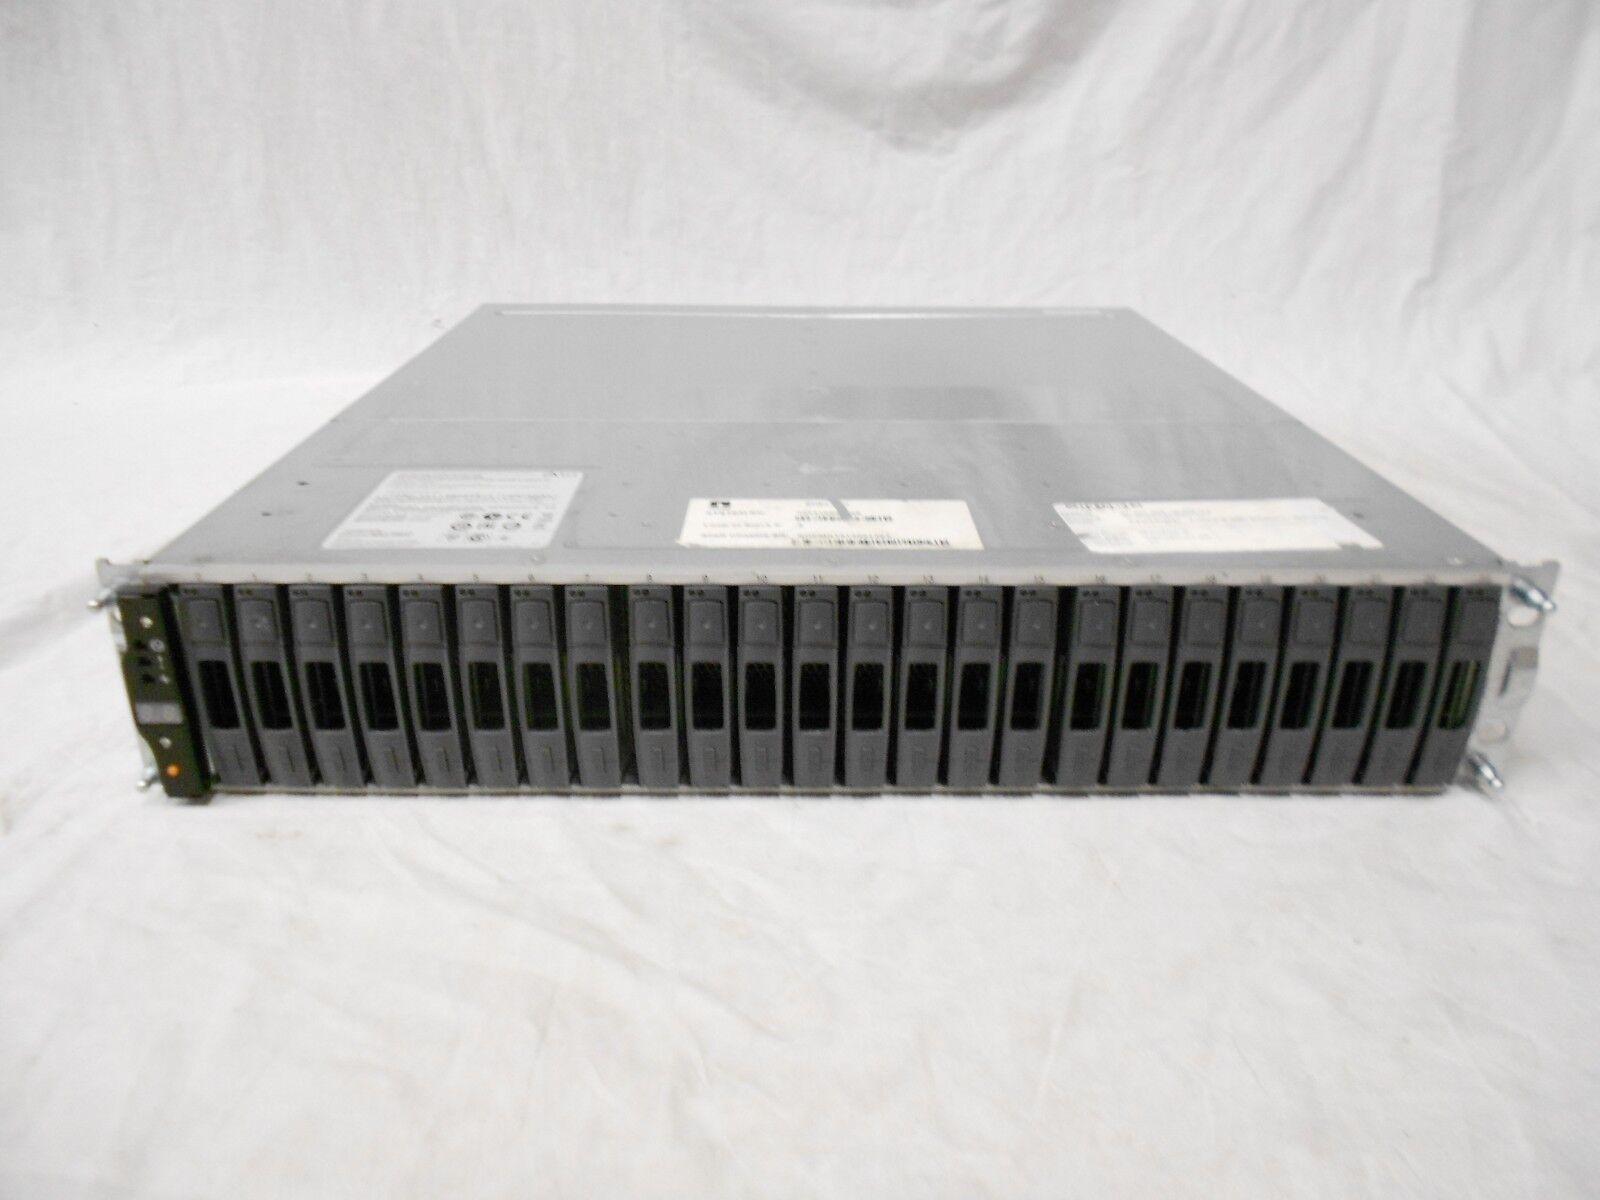 Netapp DS2246 Storage Expansion Array 24 Bay 2 5